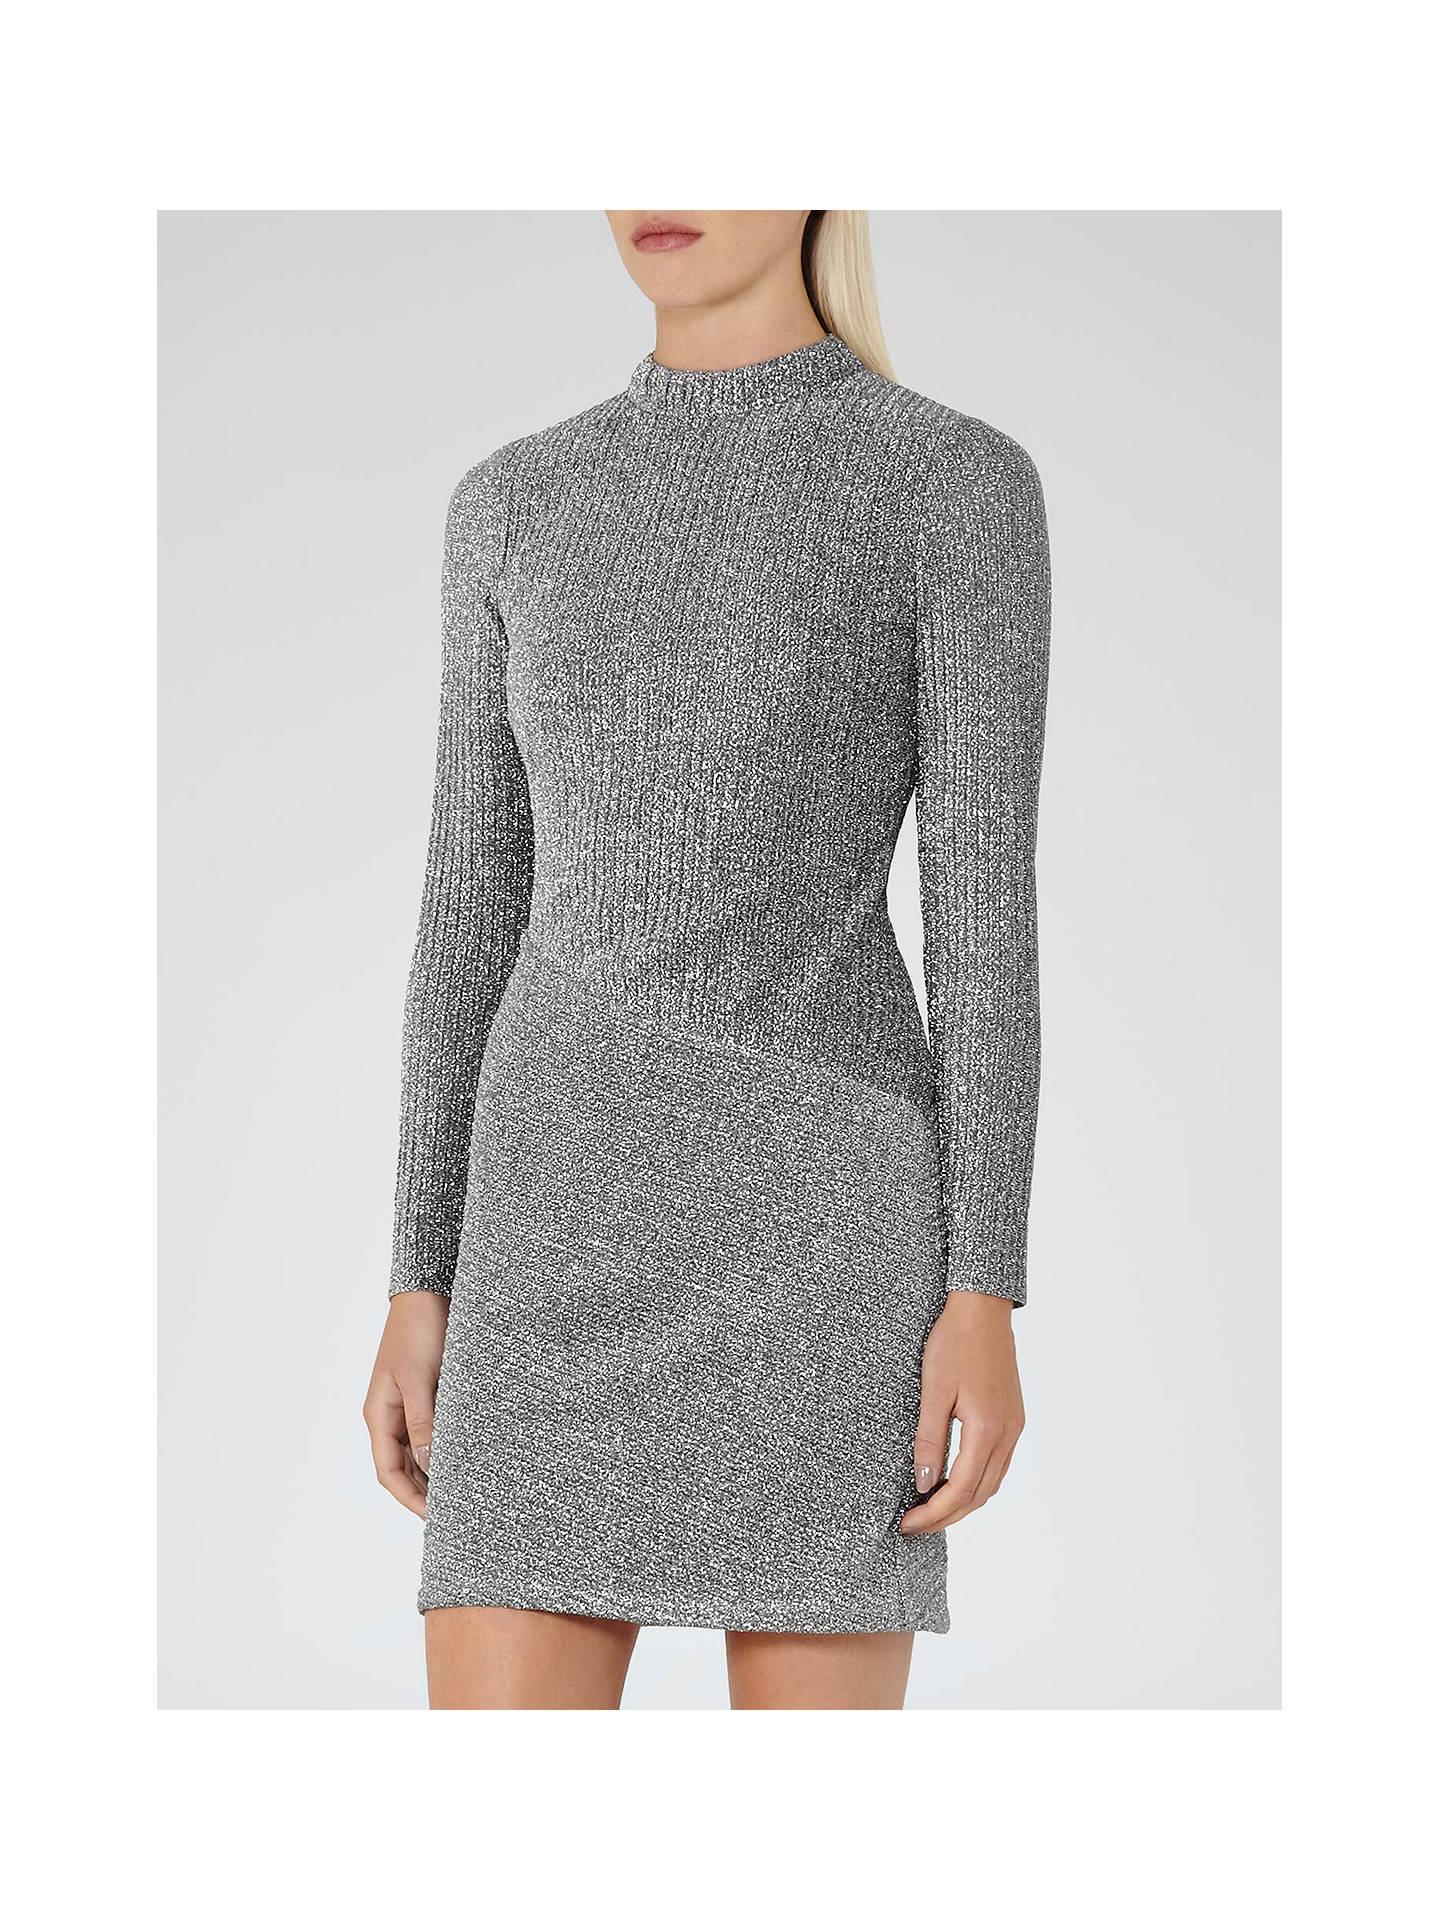 3b51edd42480 ... Buy Reiss Candy Metallic Bodycon Dress, Silver, 6 Online at  johnlewis.com ...